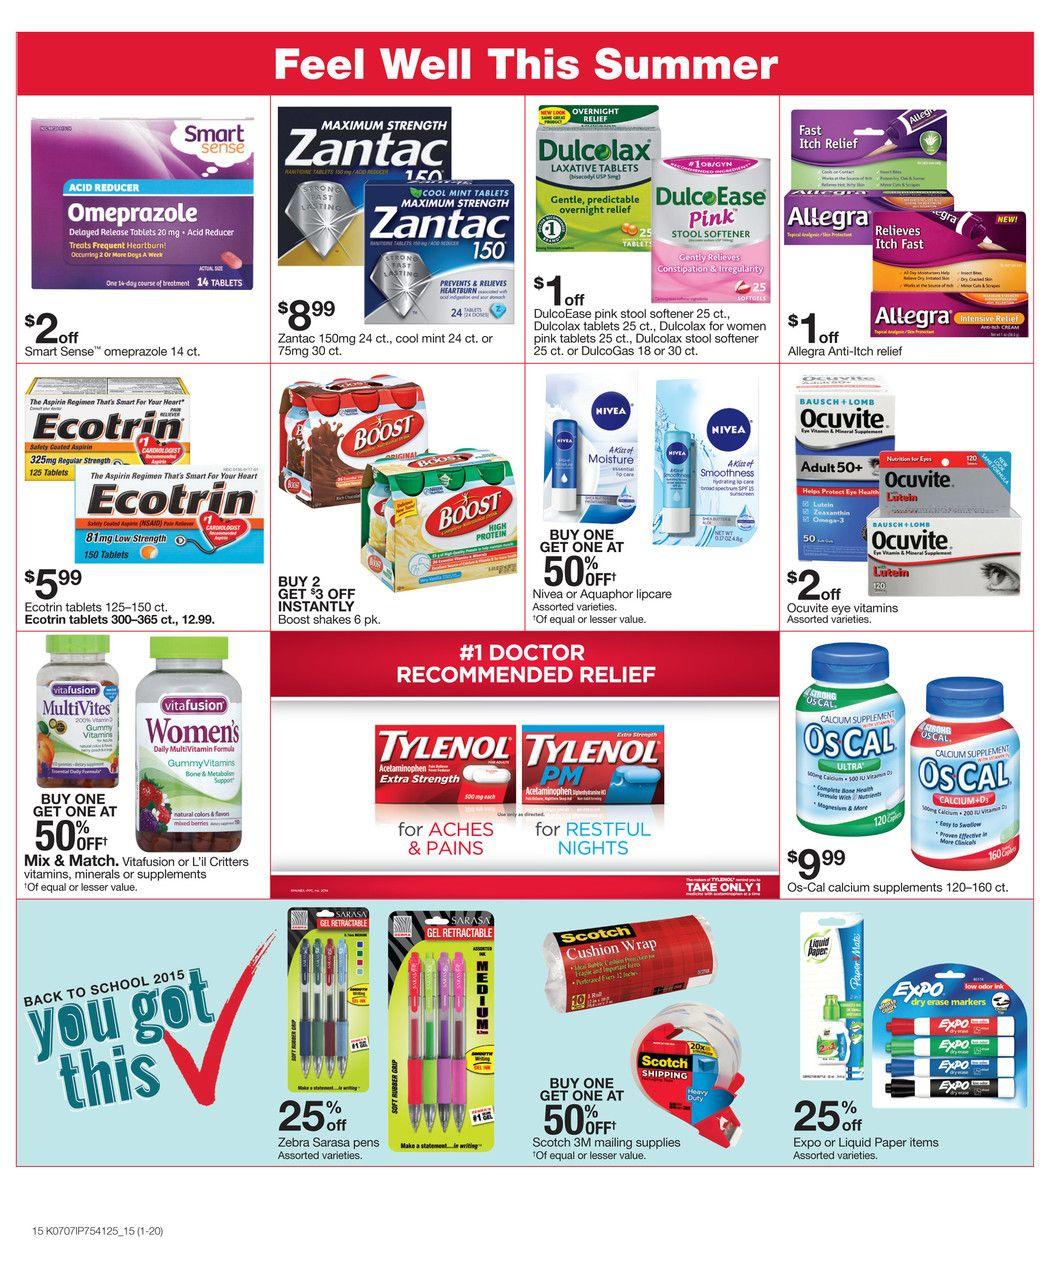 Kmart Local Ad At Spanish Fork Ut Find Deals On All Holiday Gifts Holiday Gifts Local Ads All Holidays